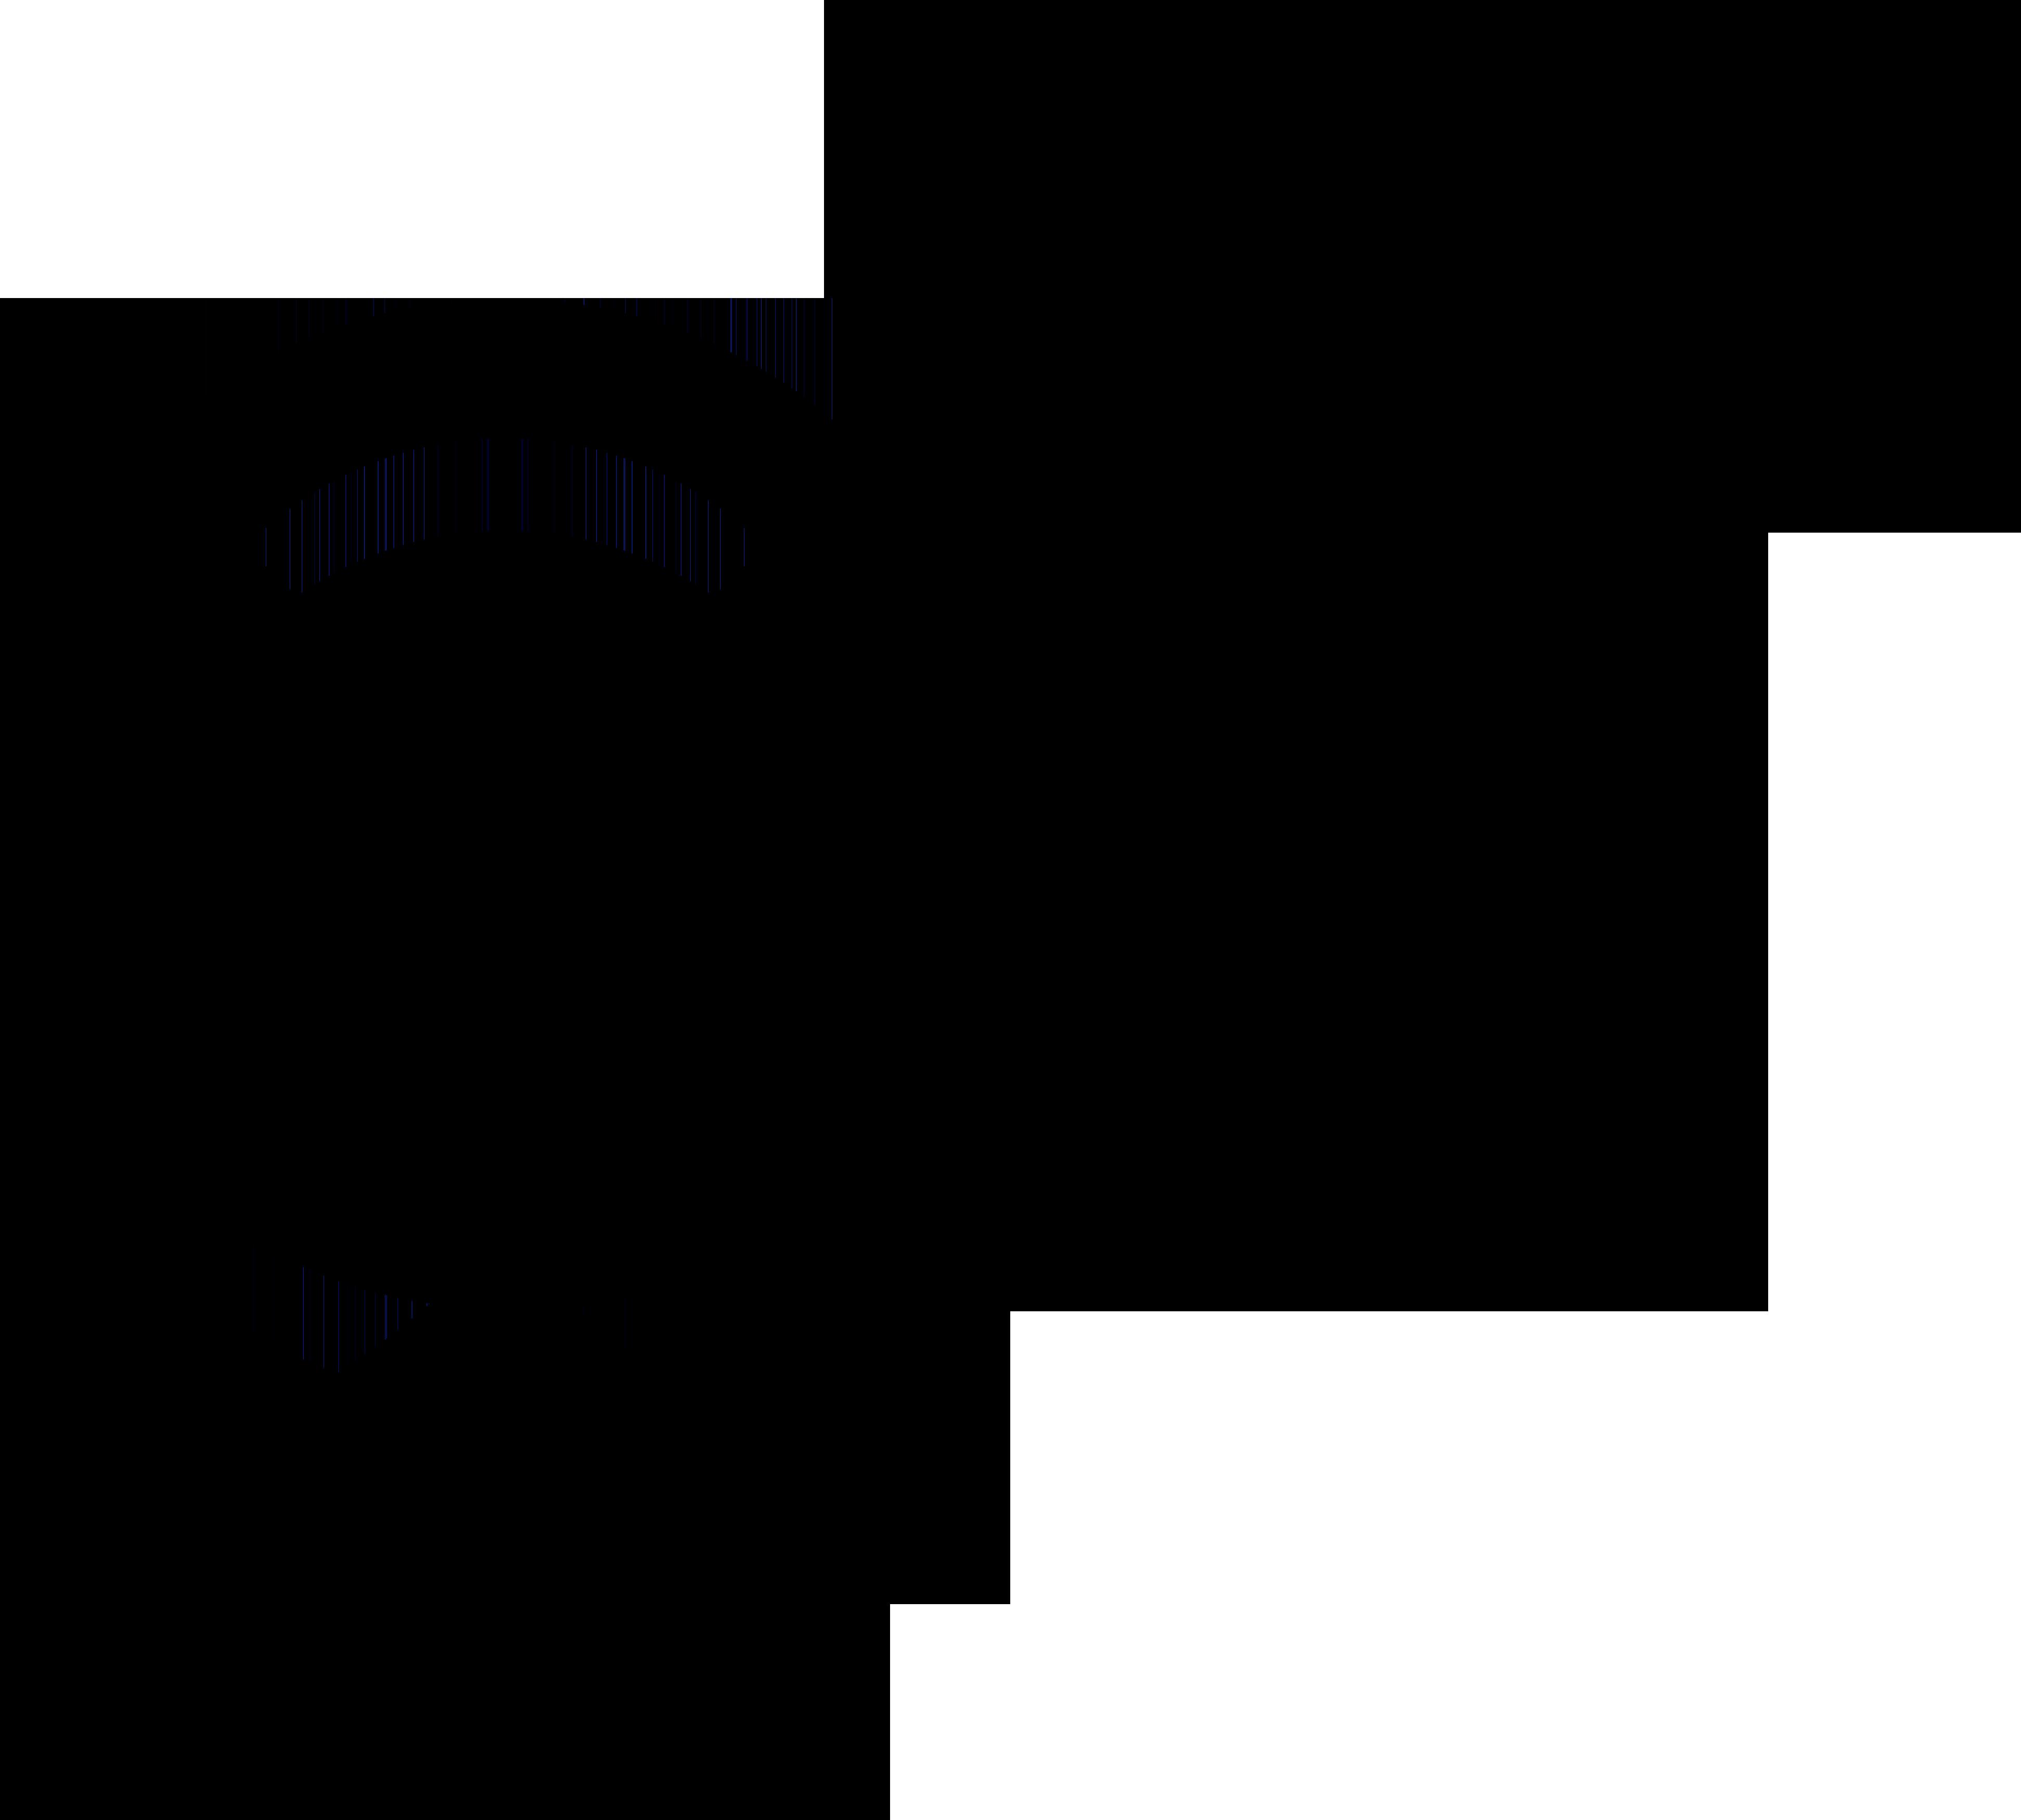 Venus symbol interlocked with nonbinary man symbol.